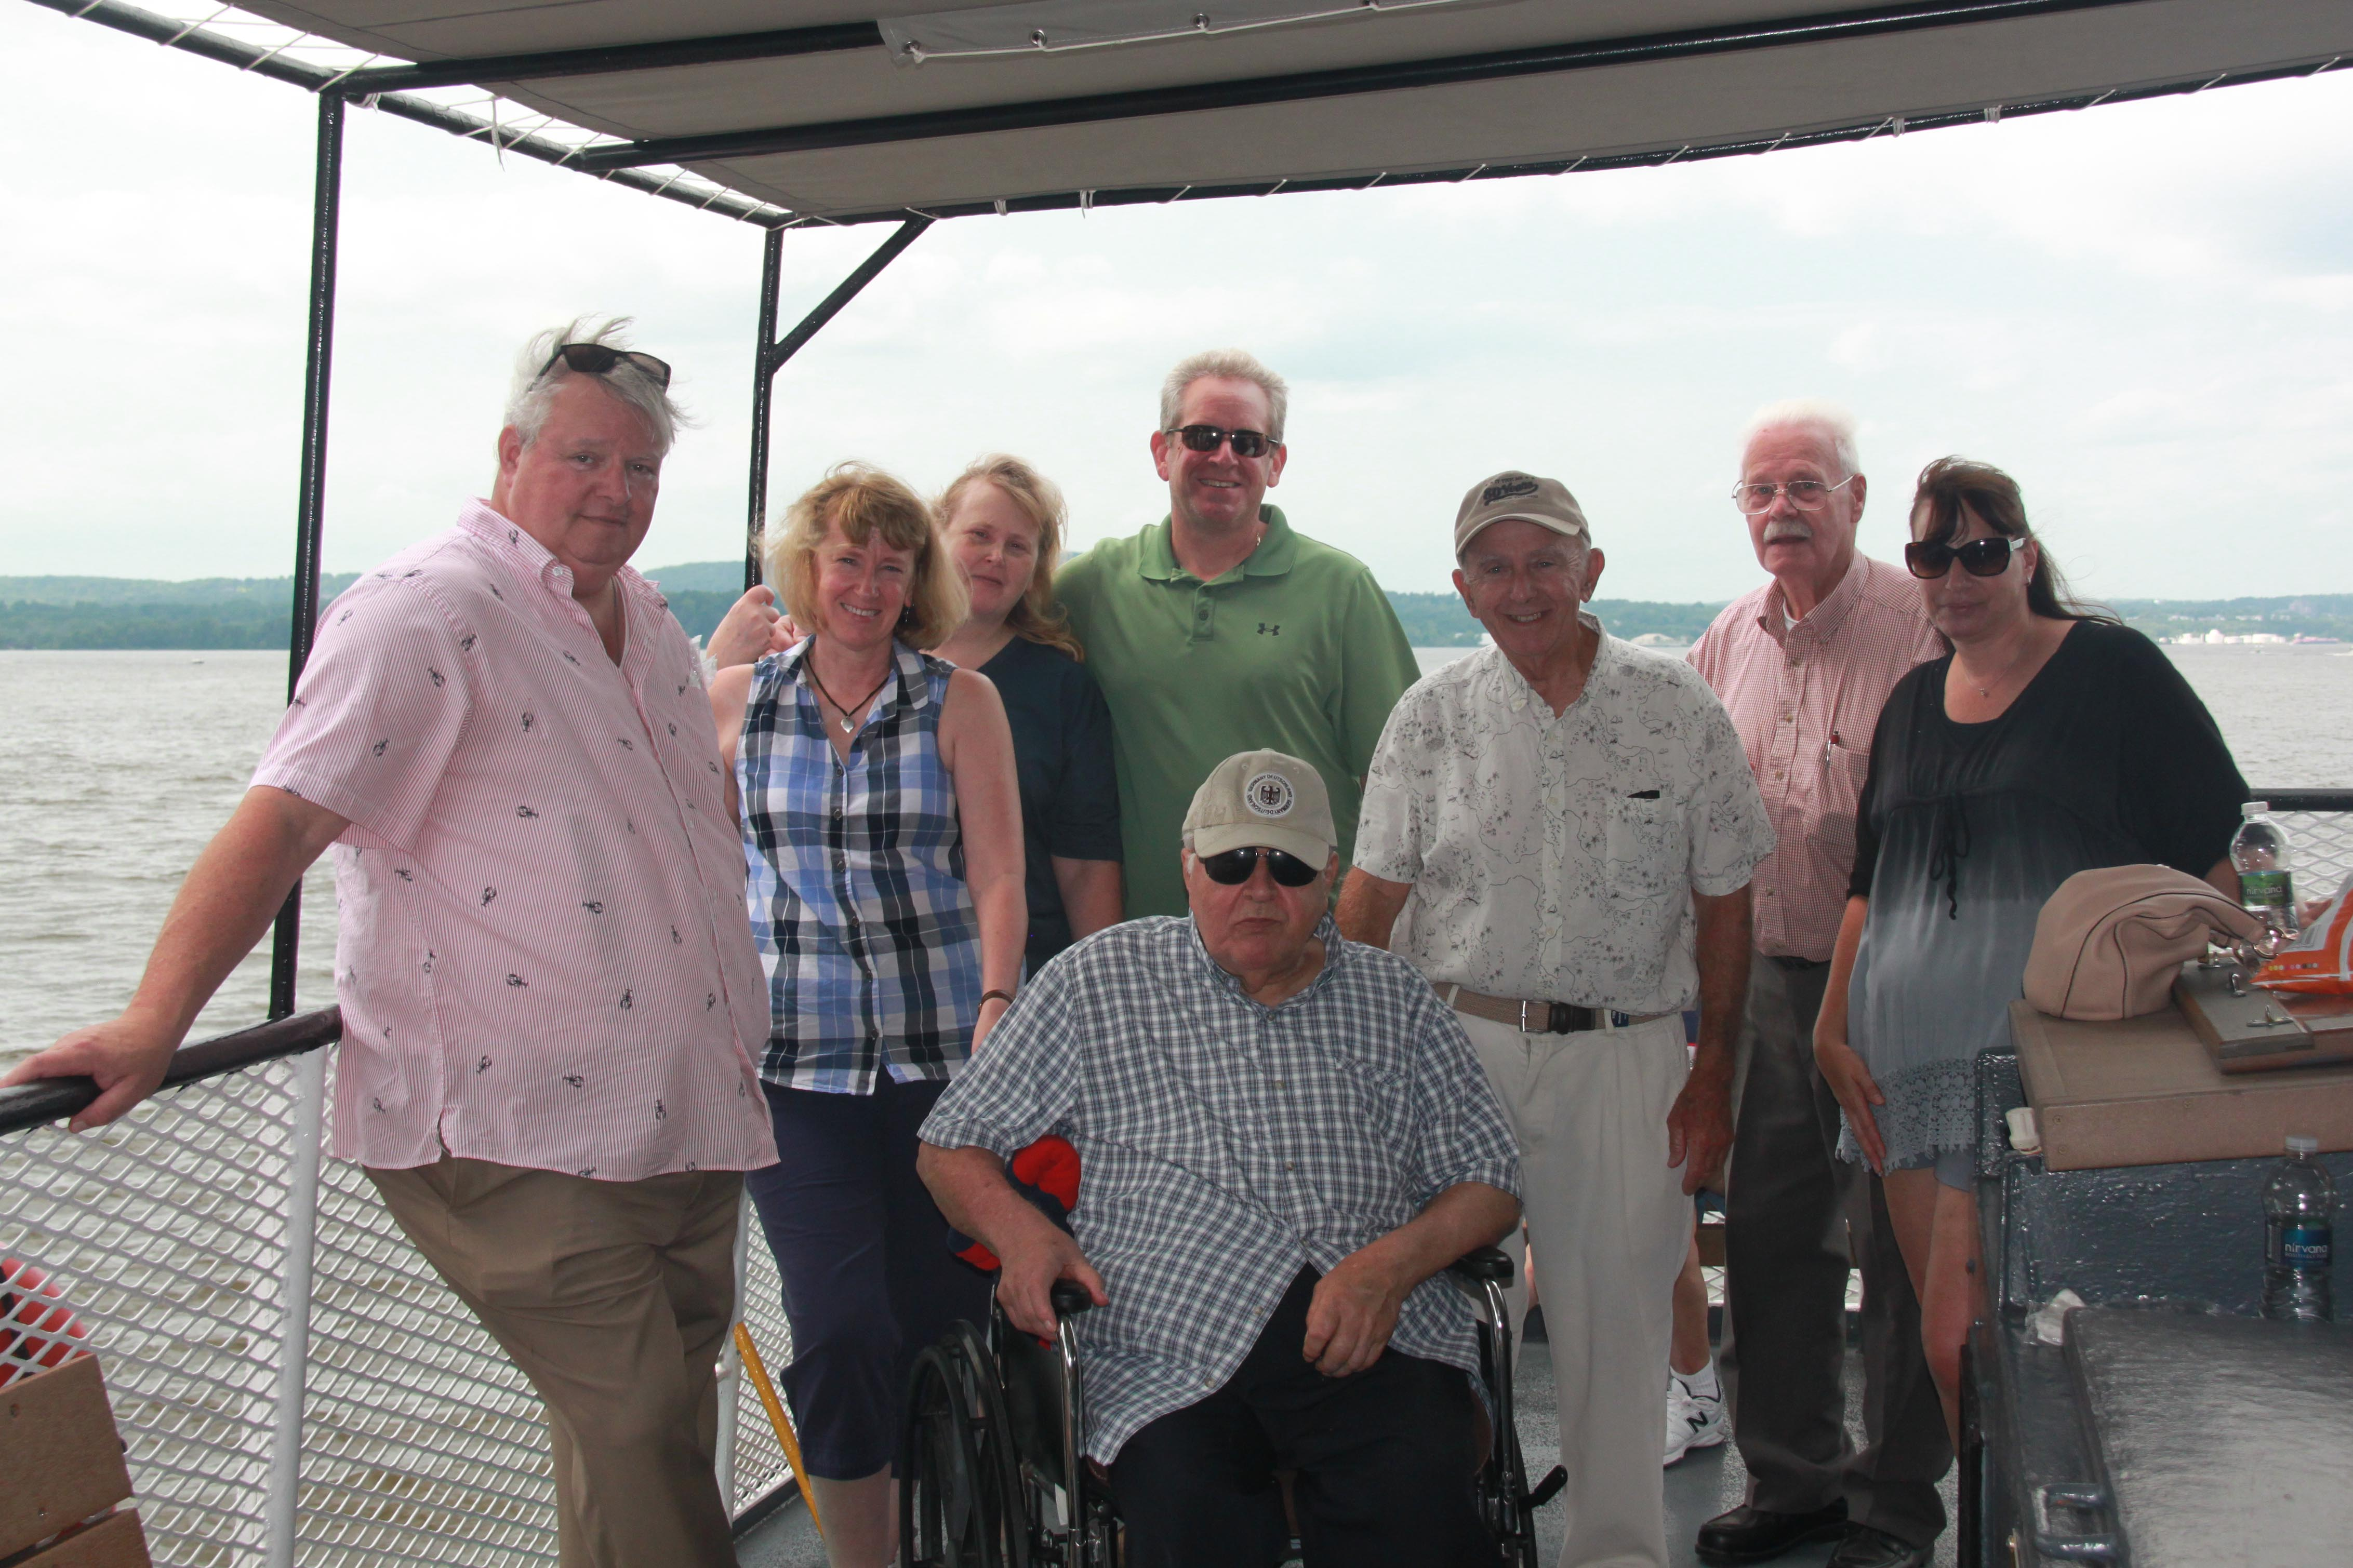 08-26-18 boat ride - 2